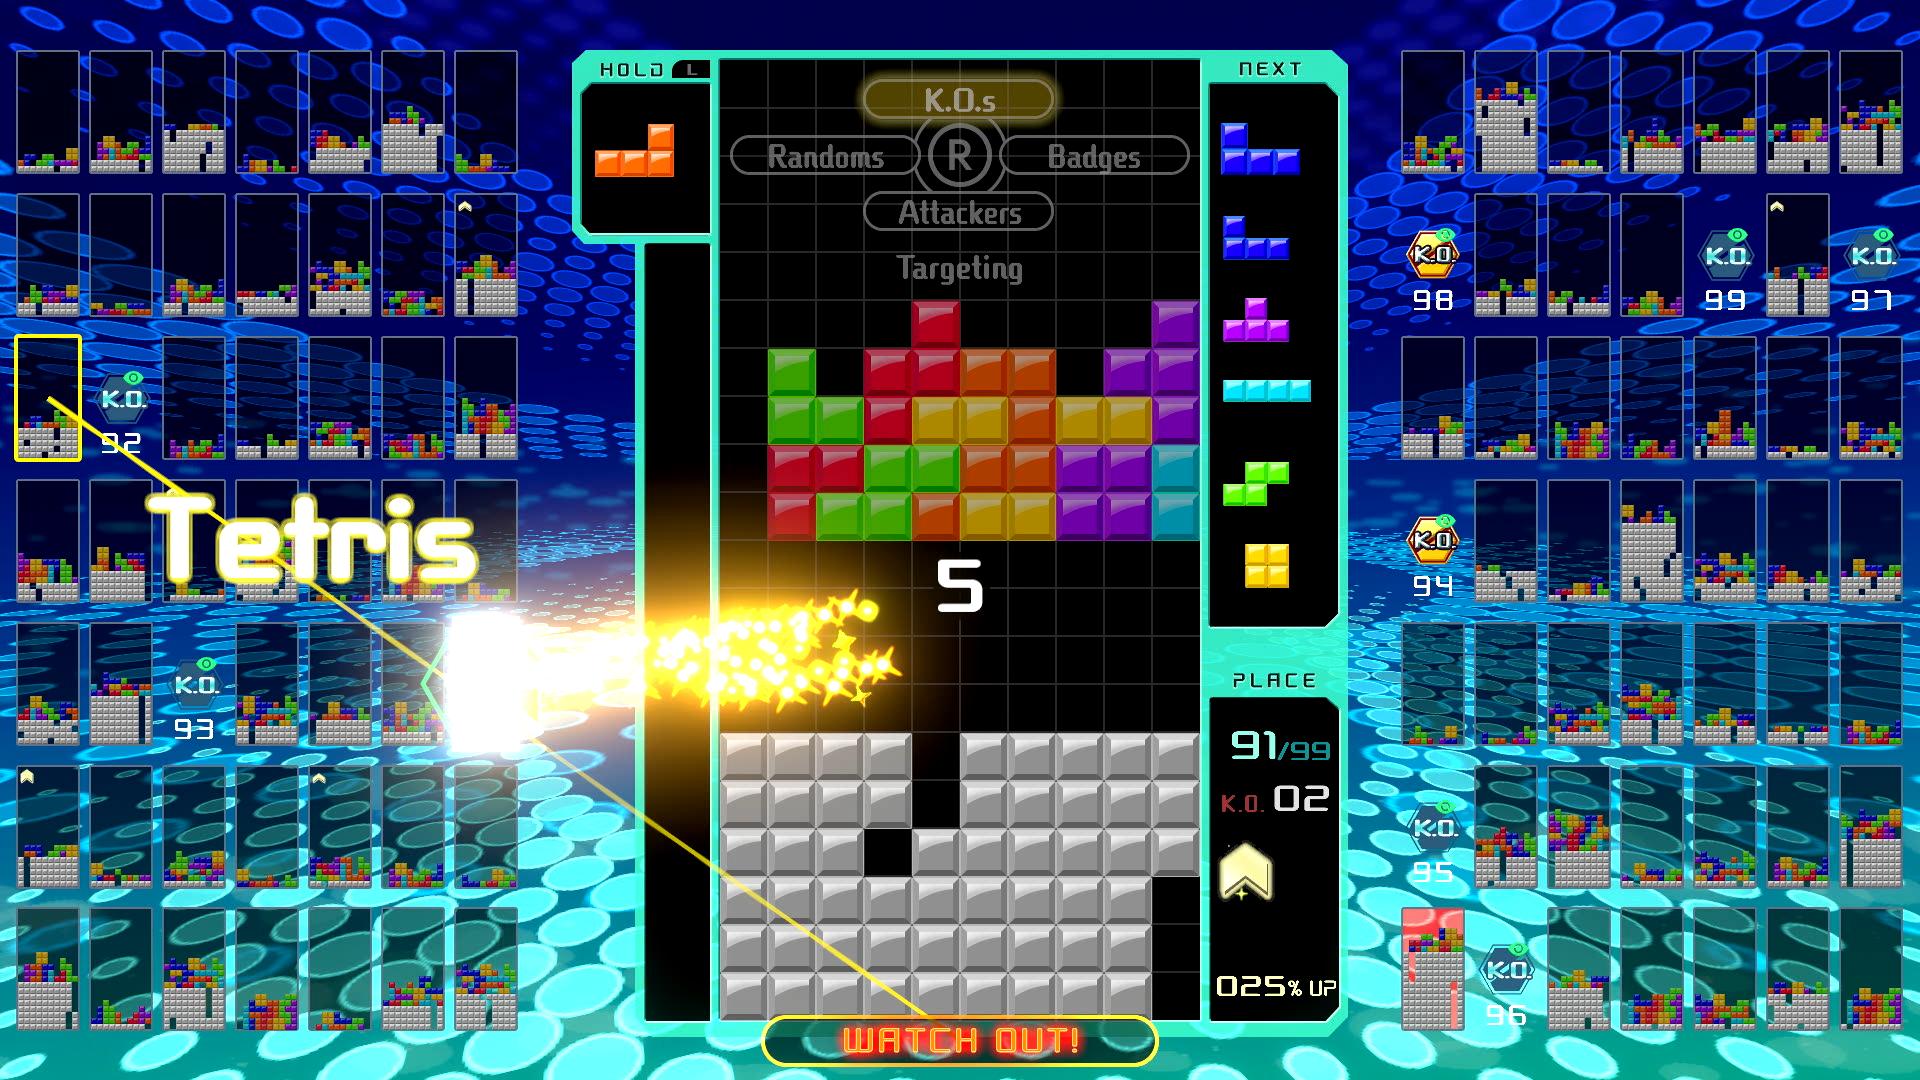 tetris 99 - top Nintendo Switch Games